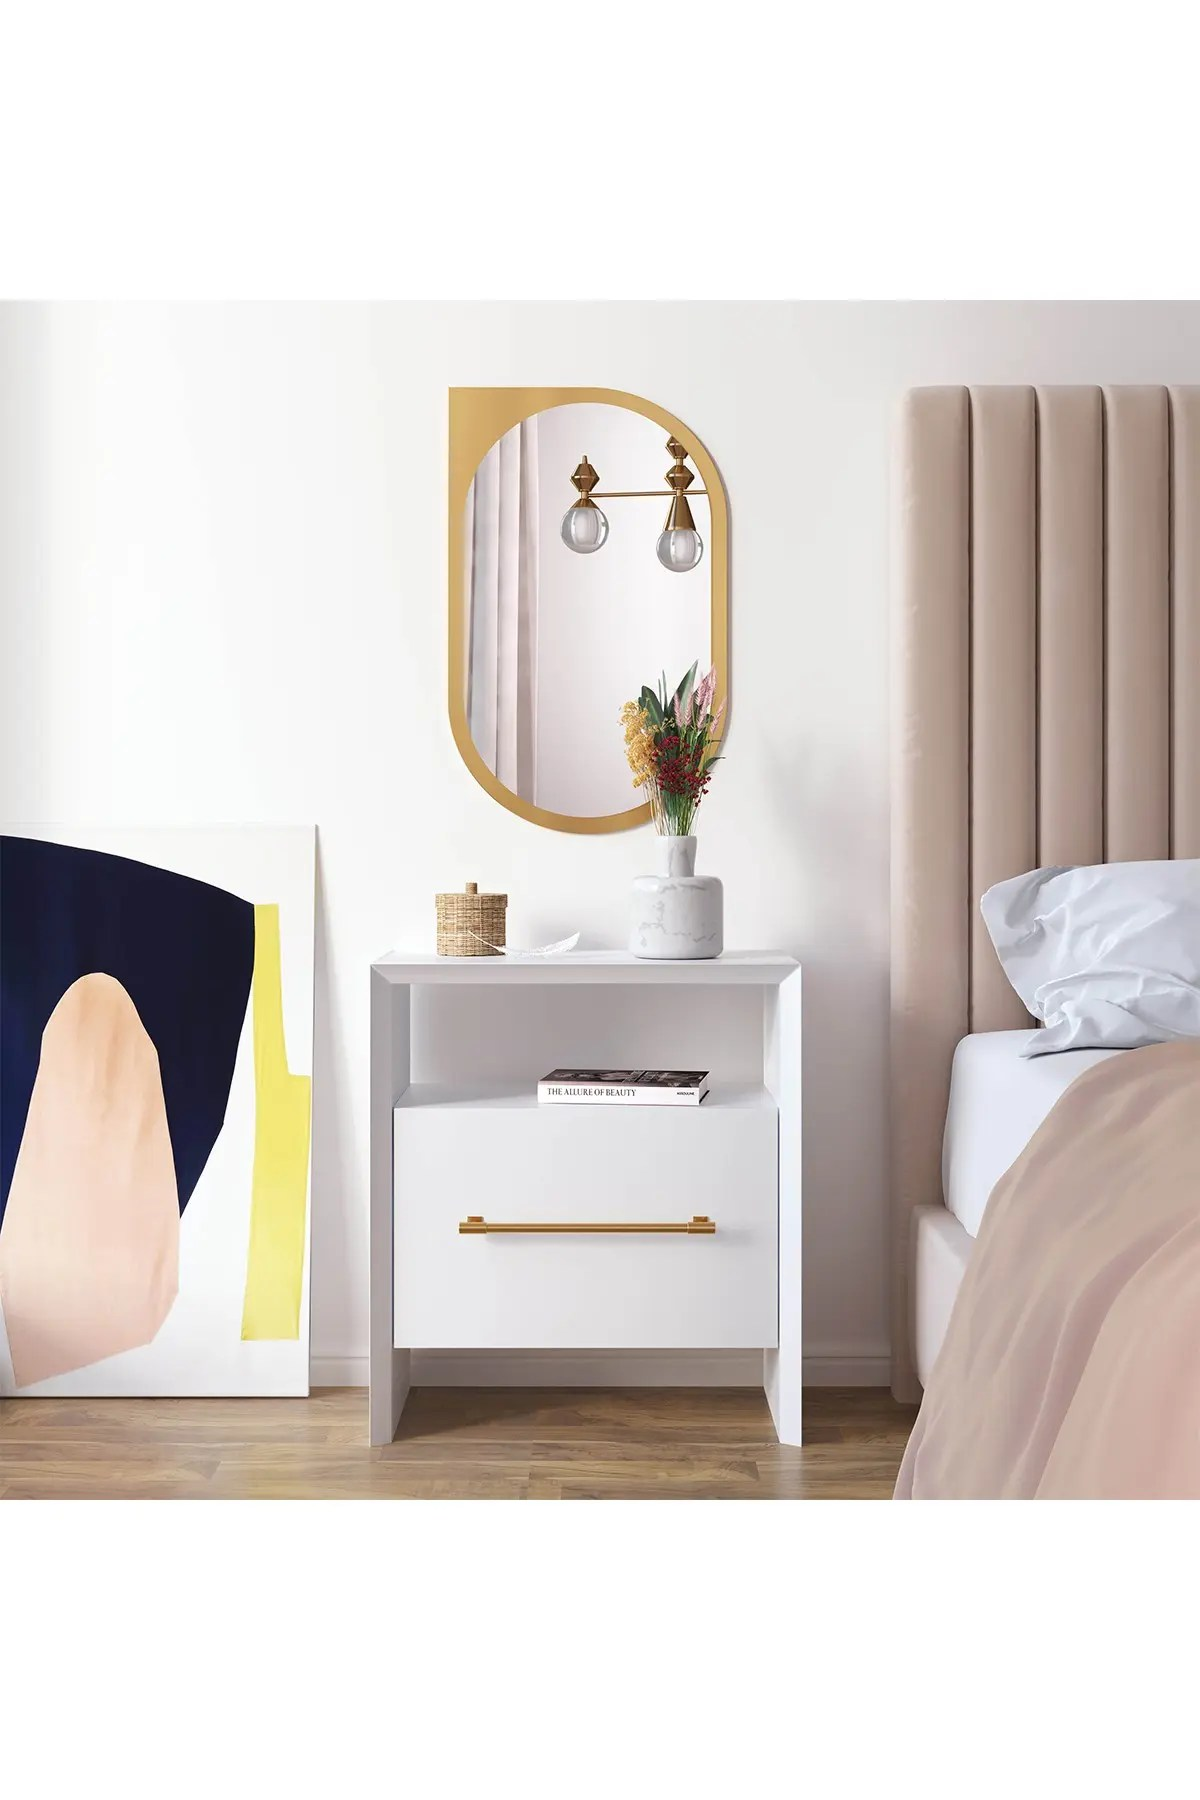 tov furniture darby oval mirror nordstrom rack